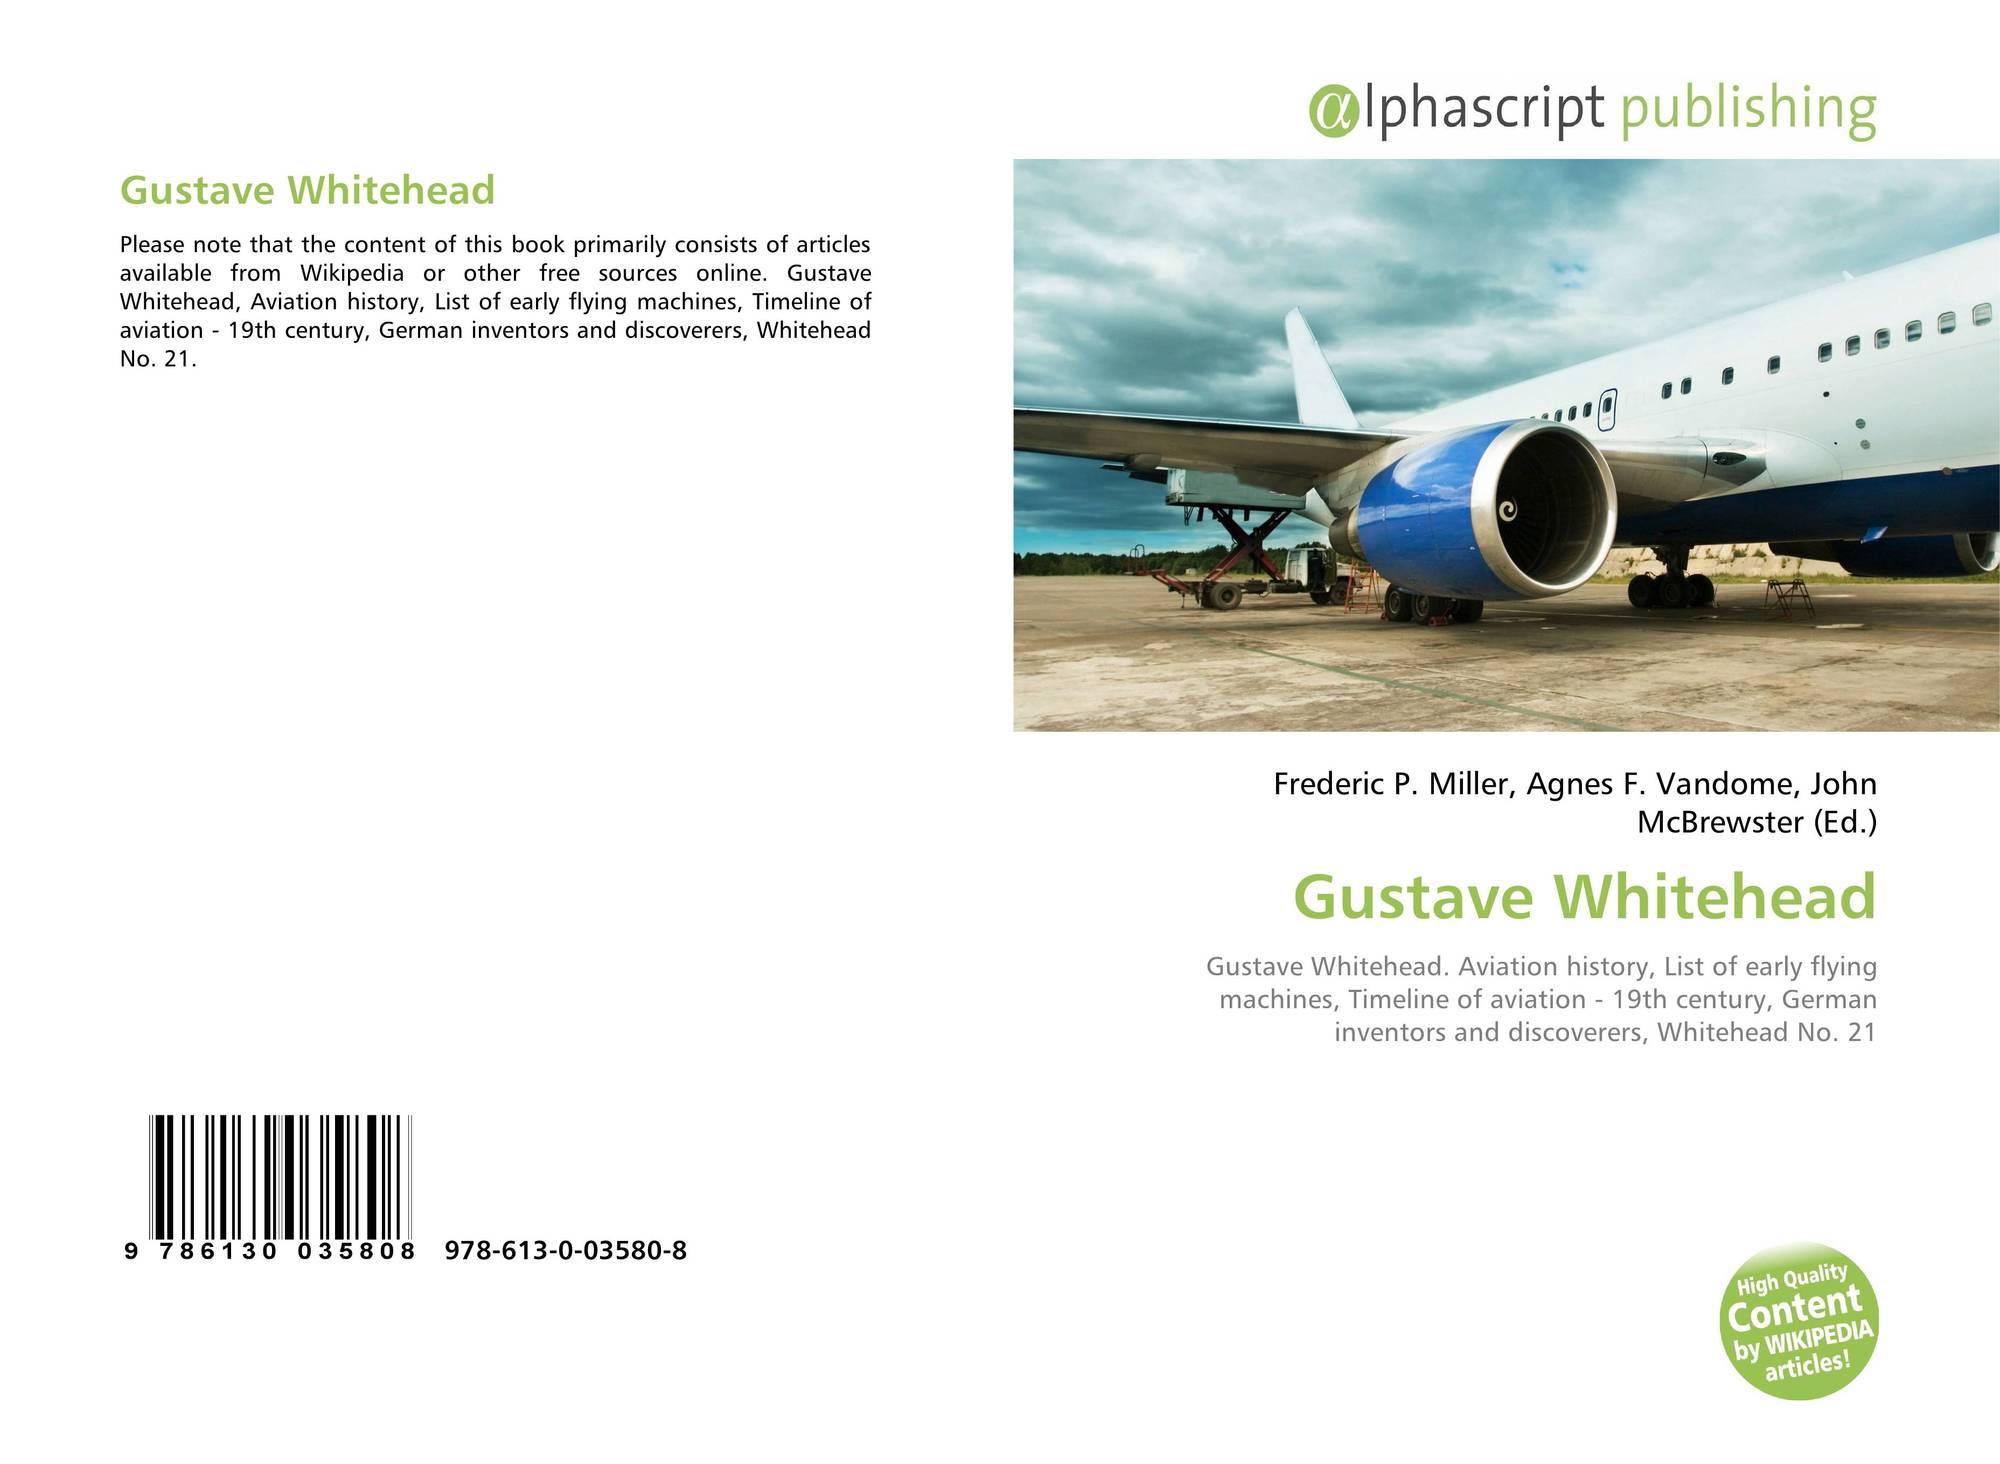 Gustave Whitehead, 978-613-0-03580-8, 6130035802 ,9786130035808